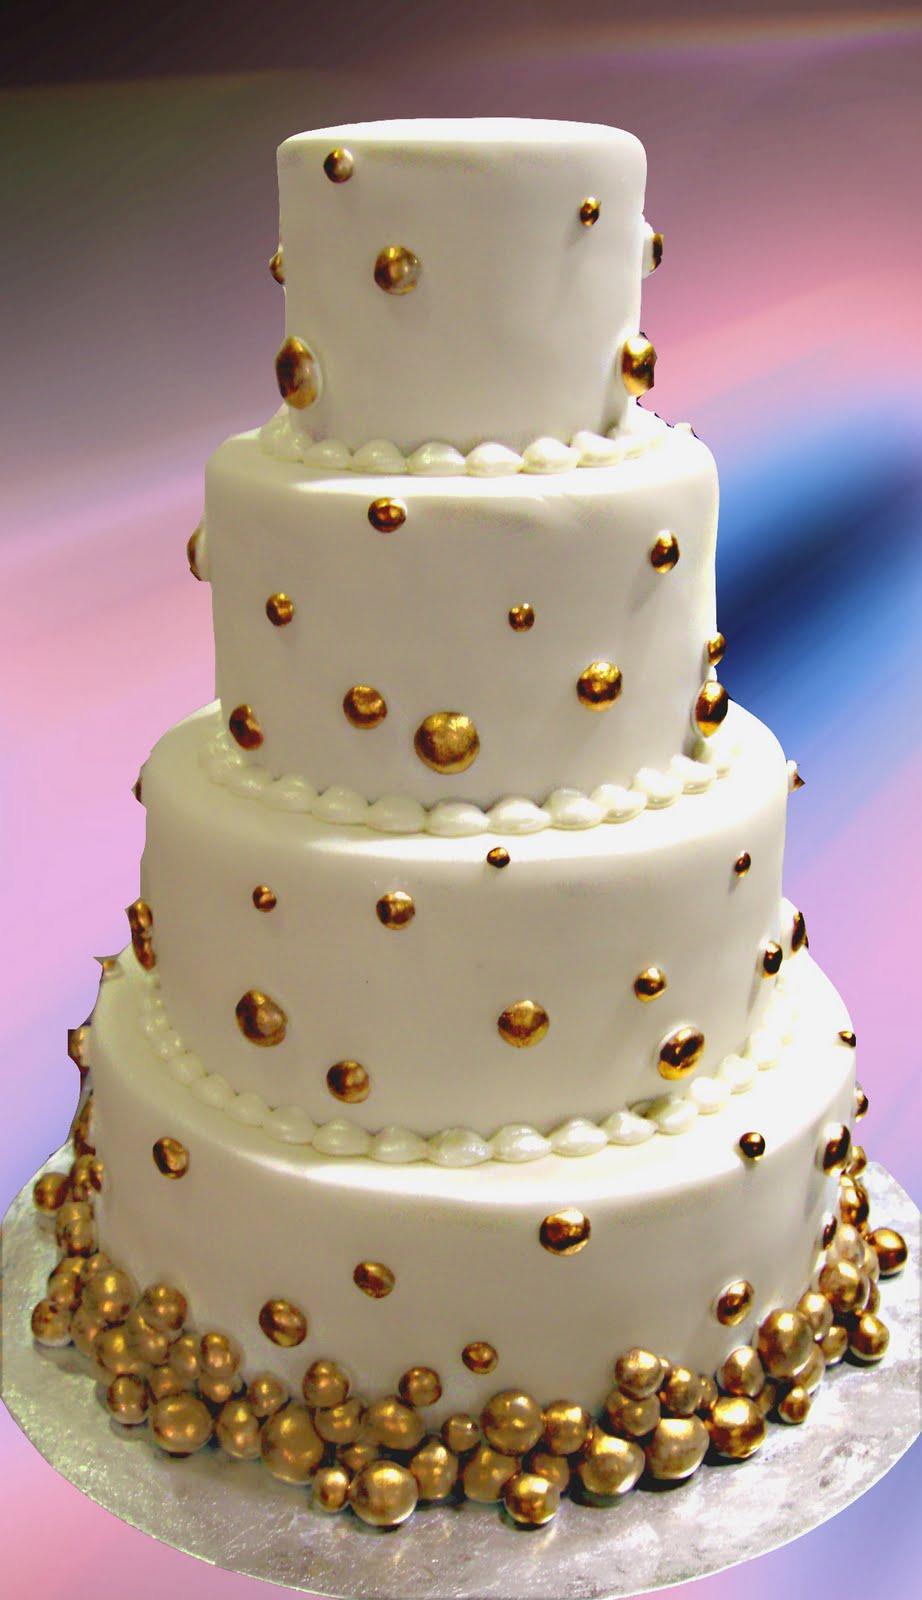 decorar ouro branco:Julinha Fontelles: Anos Dourados